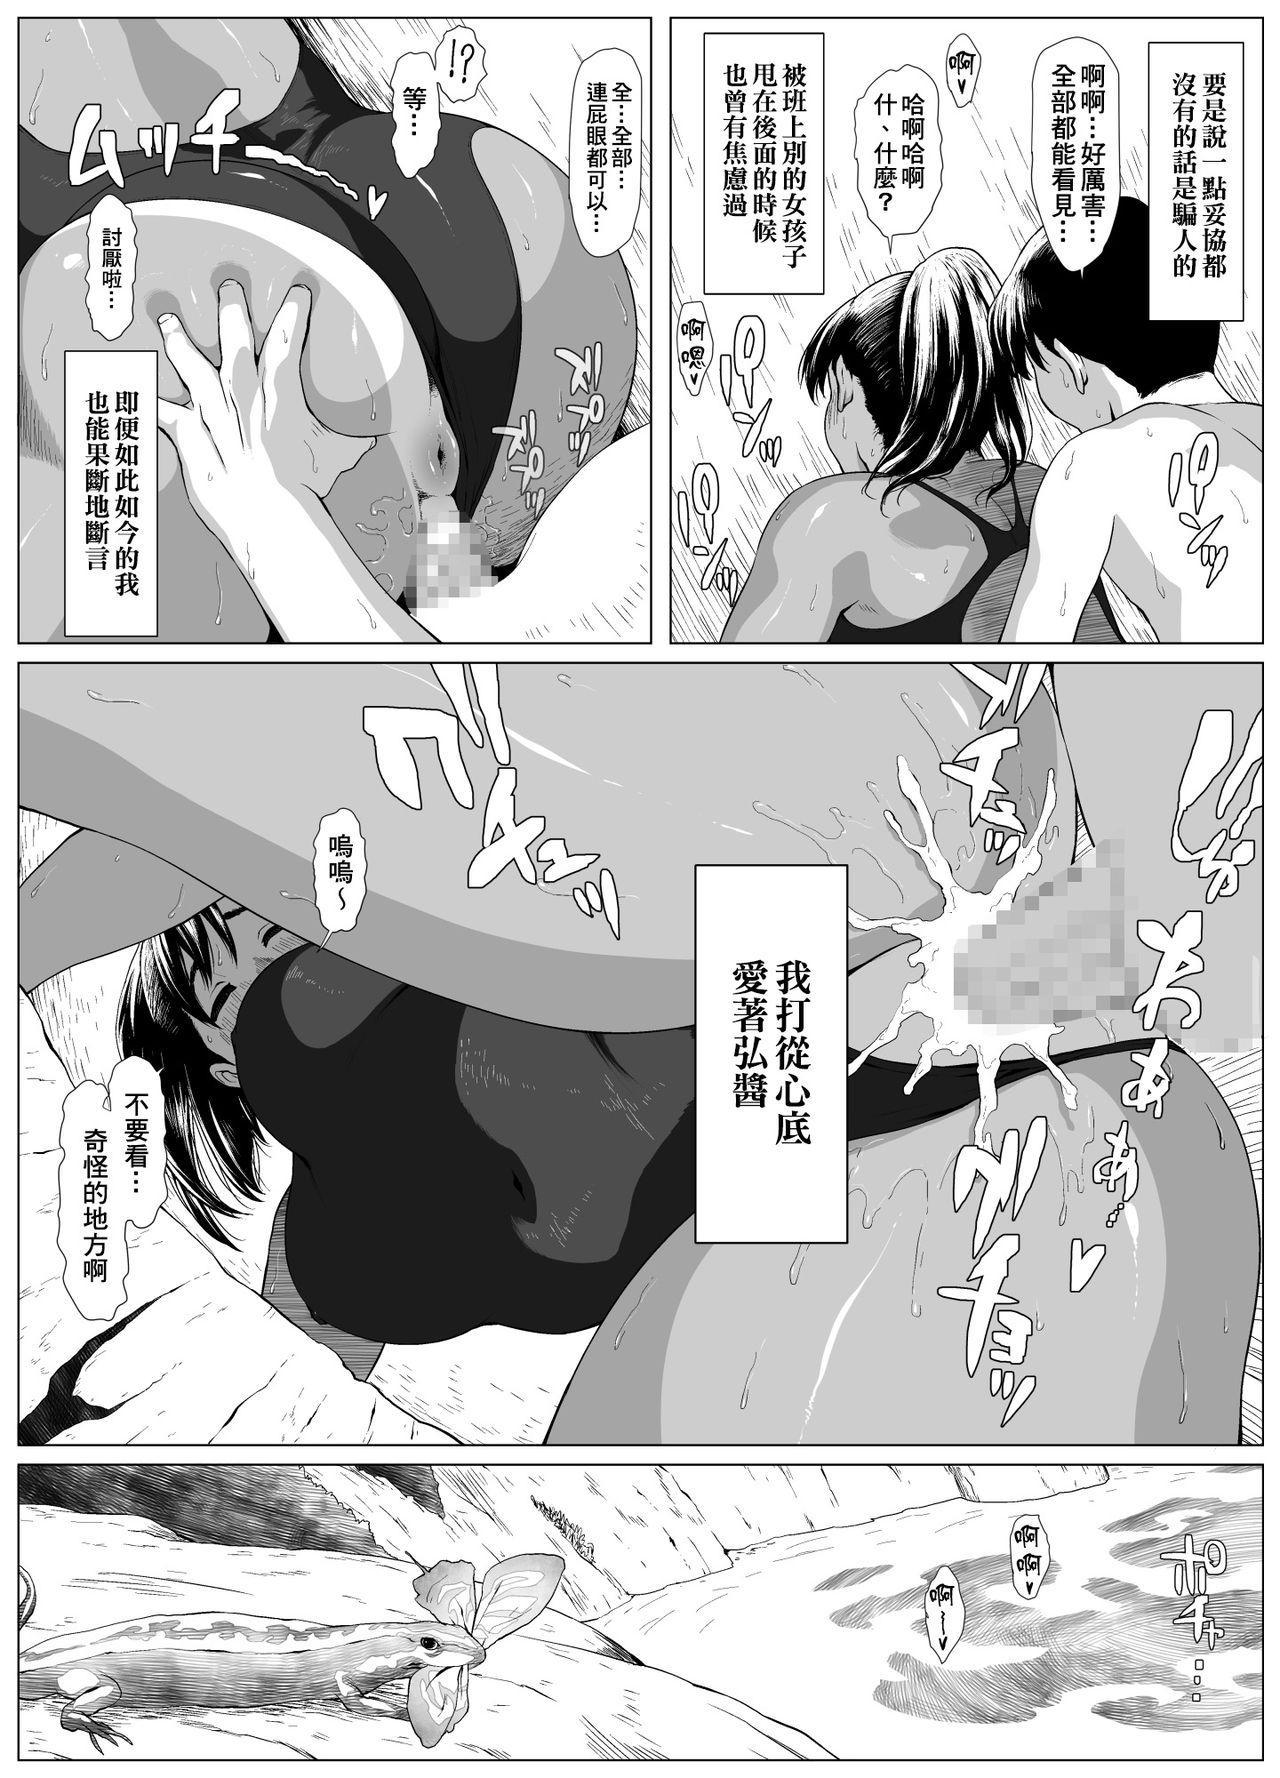 Koufukuron - Murase Ayumi Hen 1 7